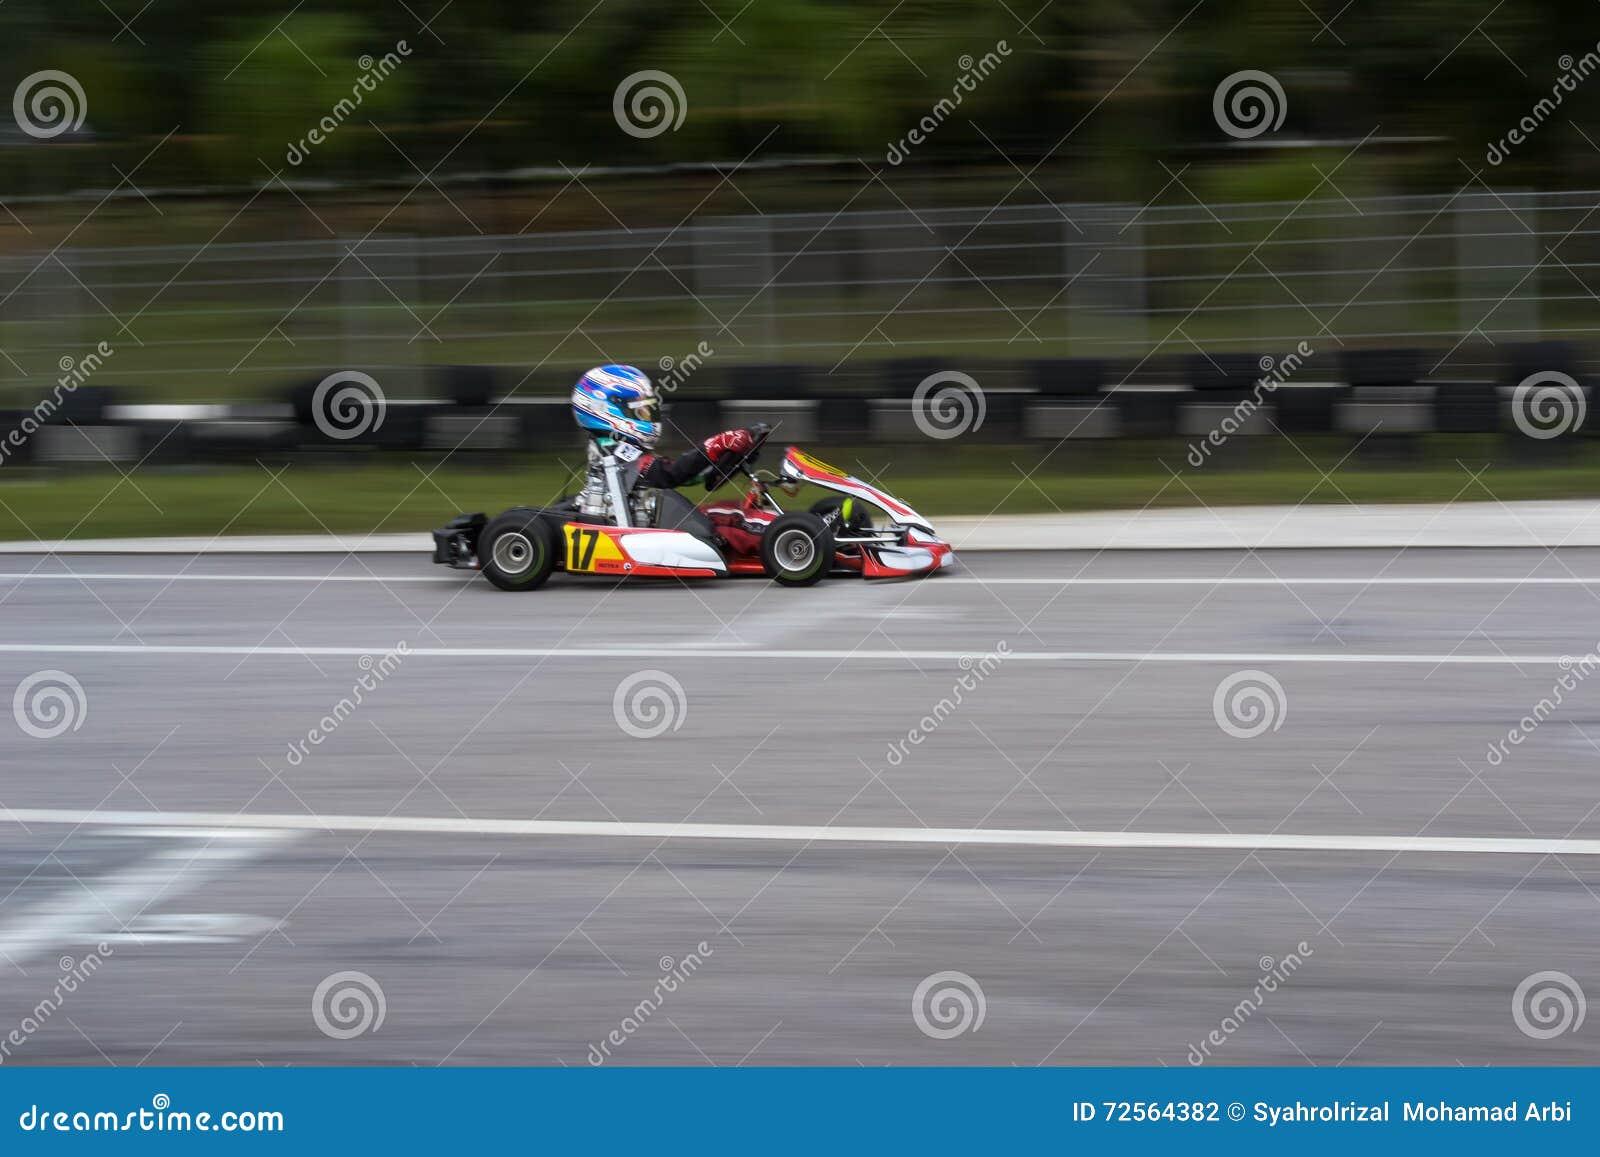 Go kart racing sports editorial photography  Image of racing - 72564382